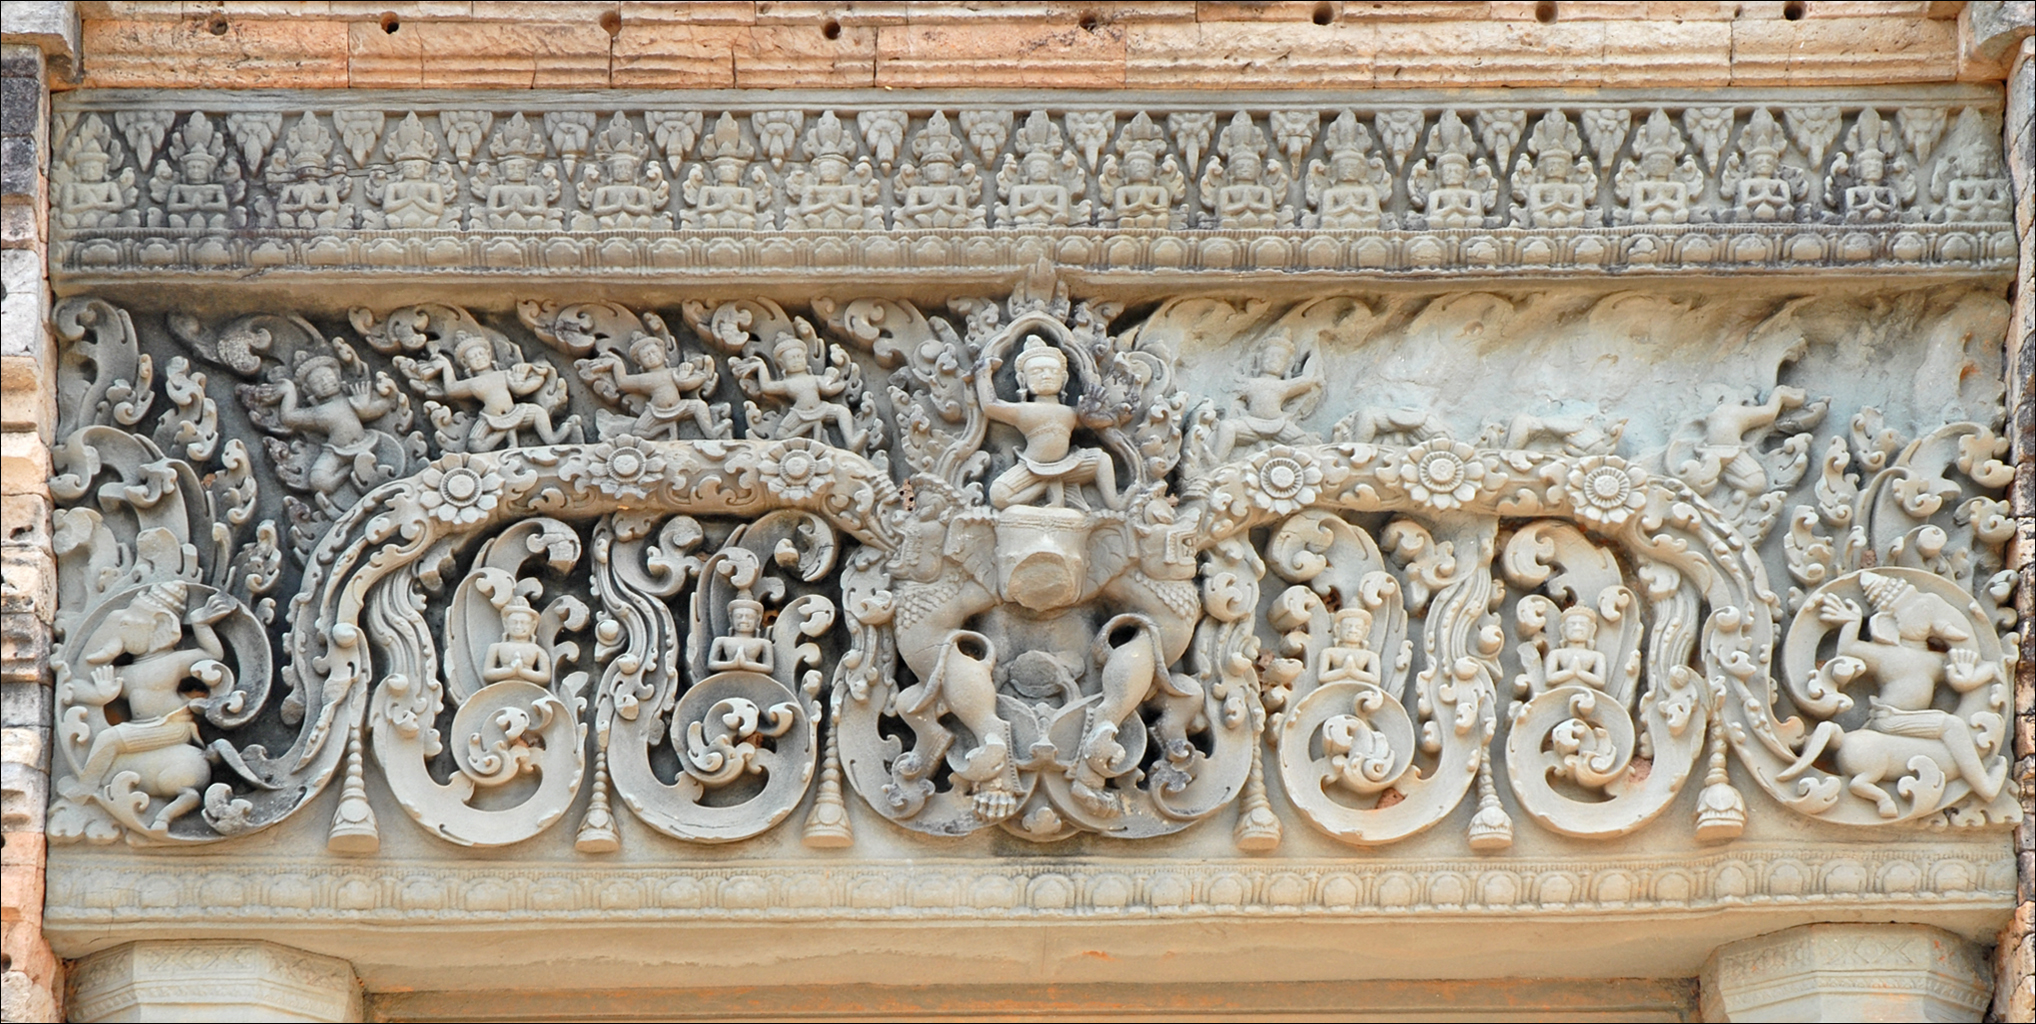 Ganesh Trompe A Droite file:le mébon oriental (angkor) (6807648582) - wikimedia